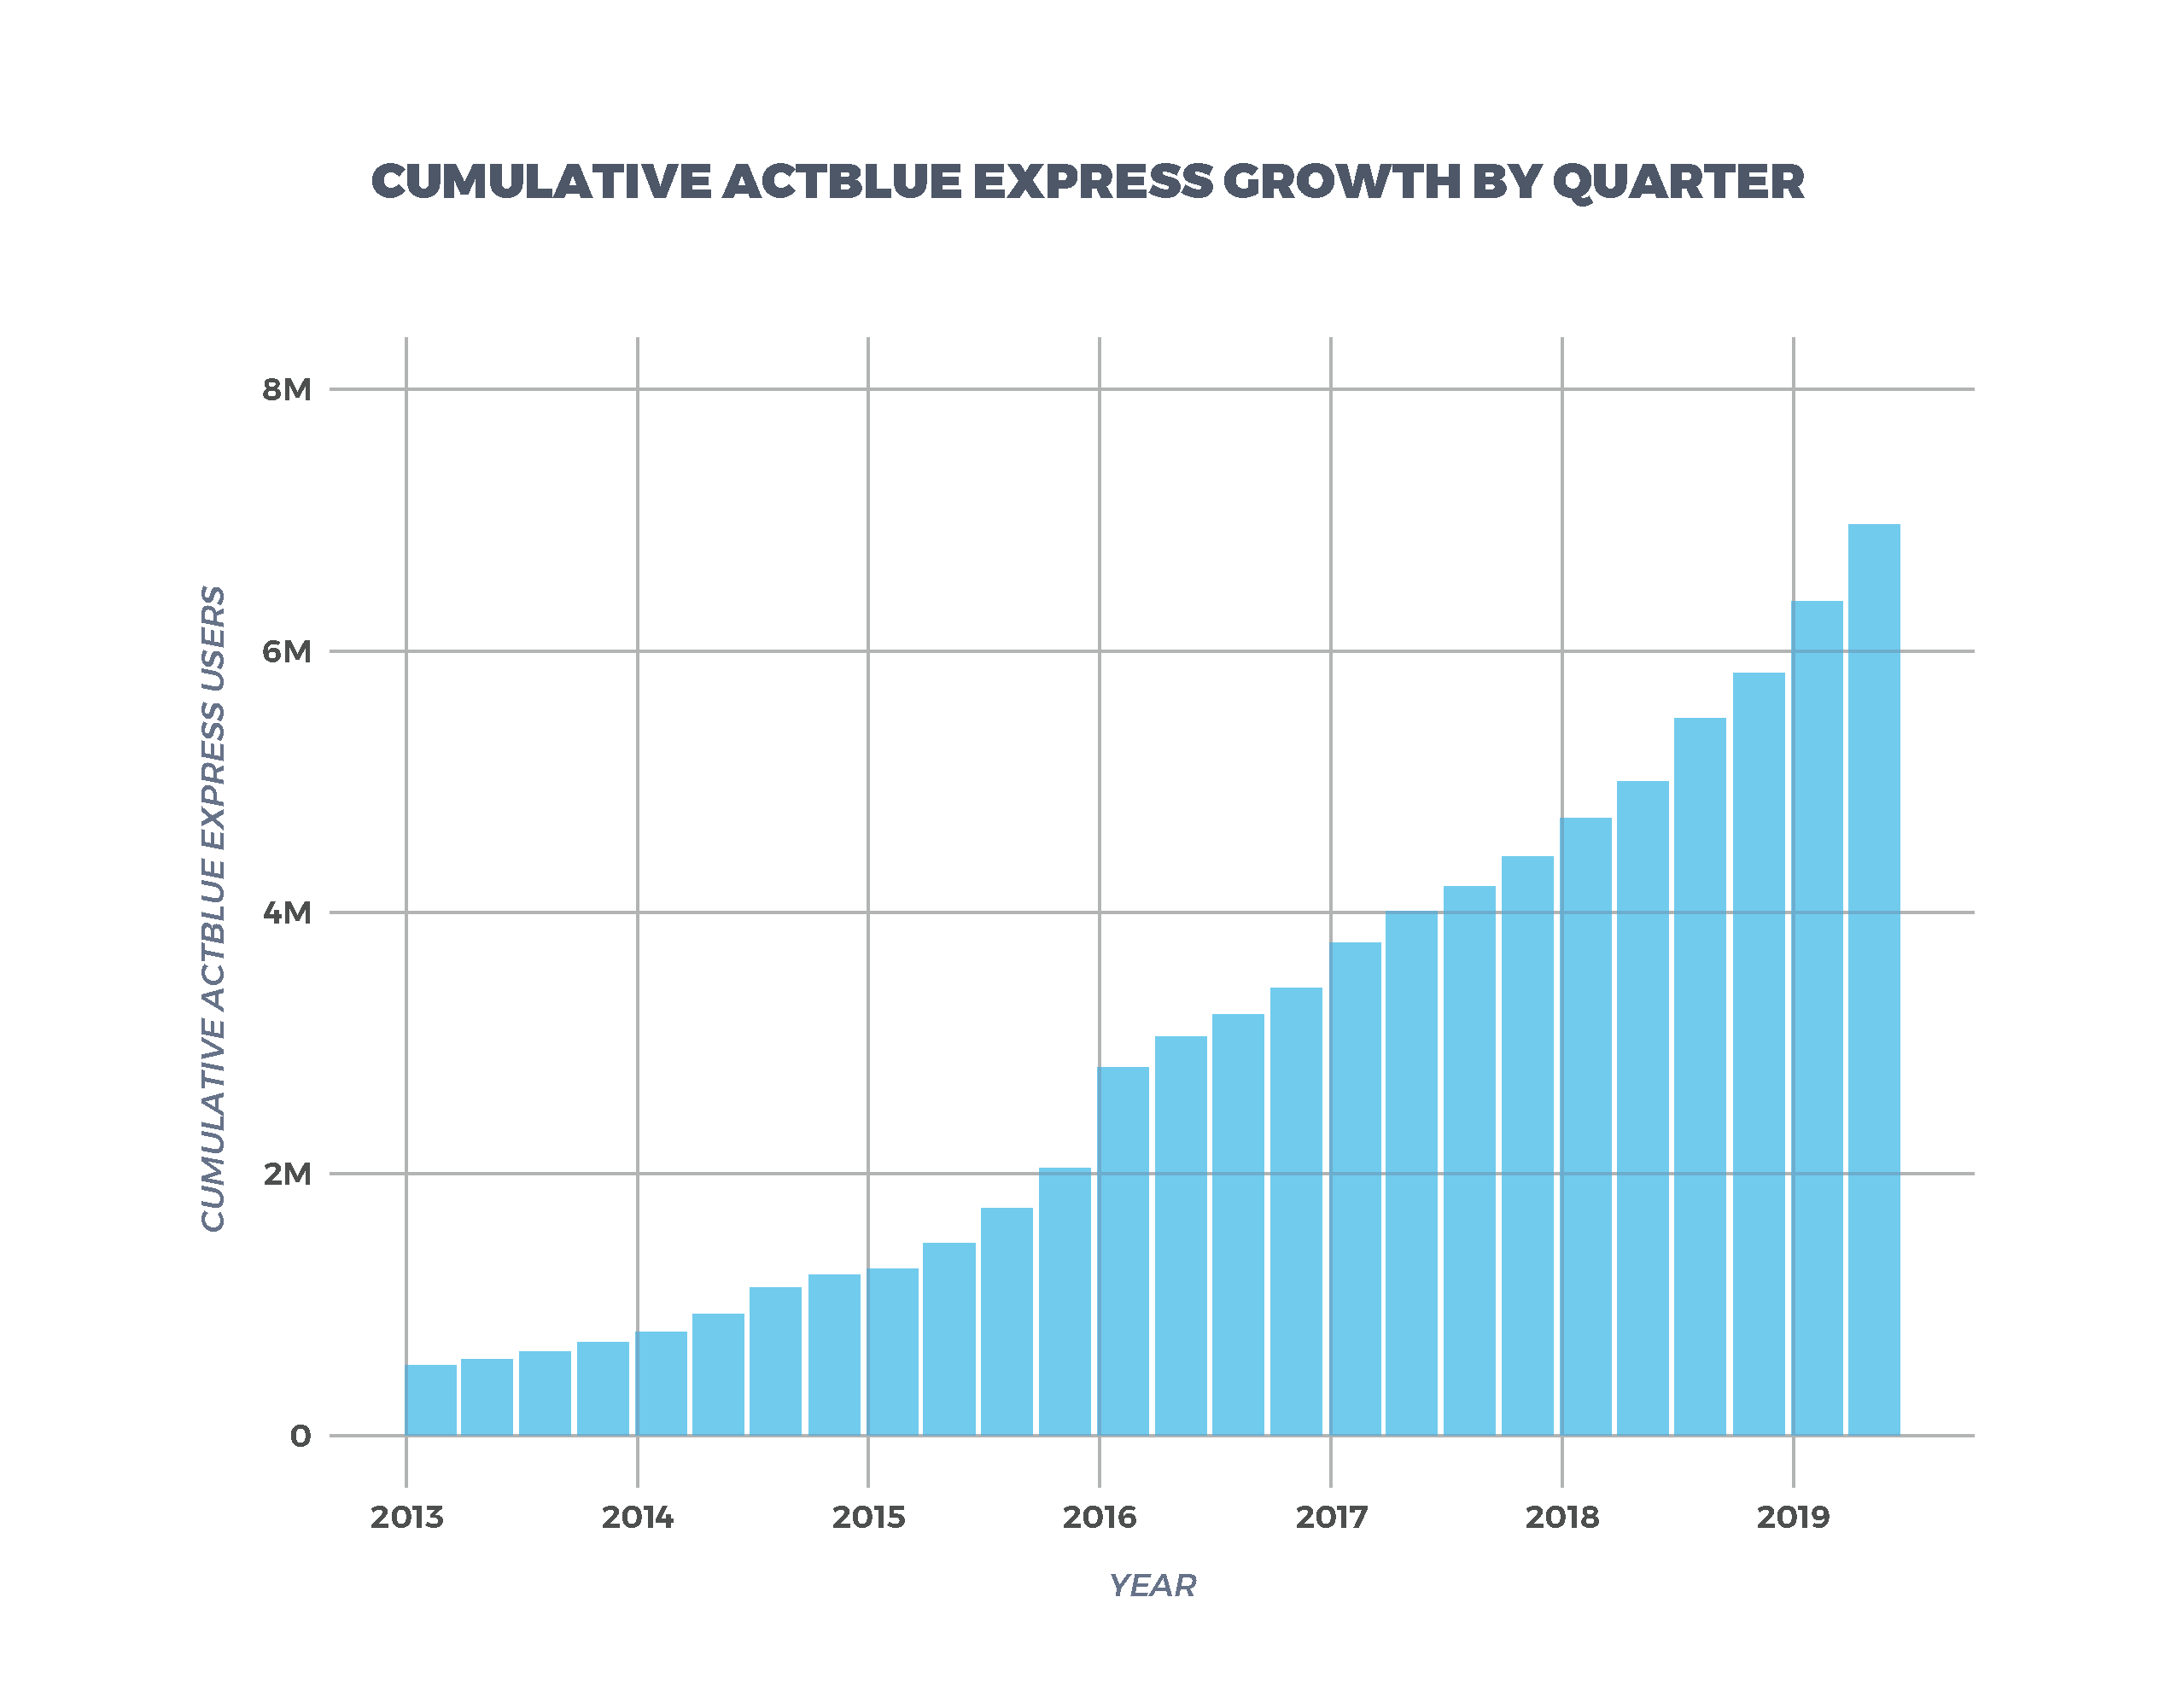 Cumulative ActBlue Express Growth By Quarter